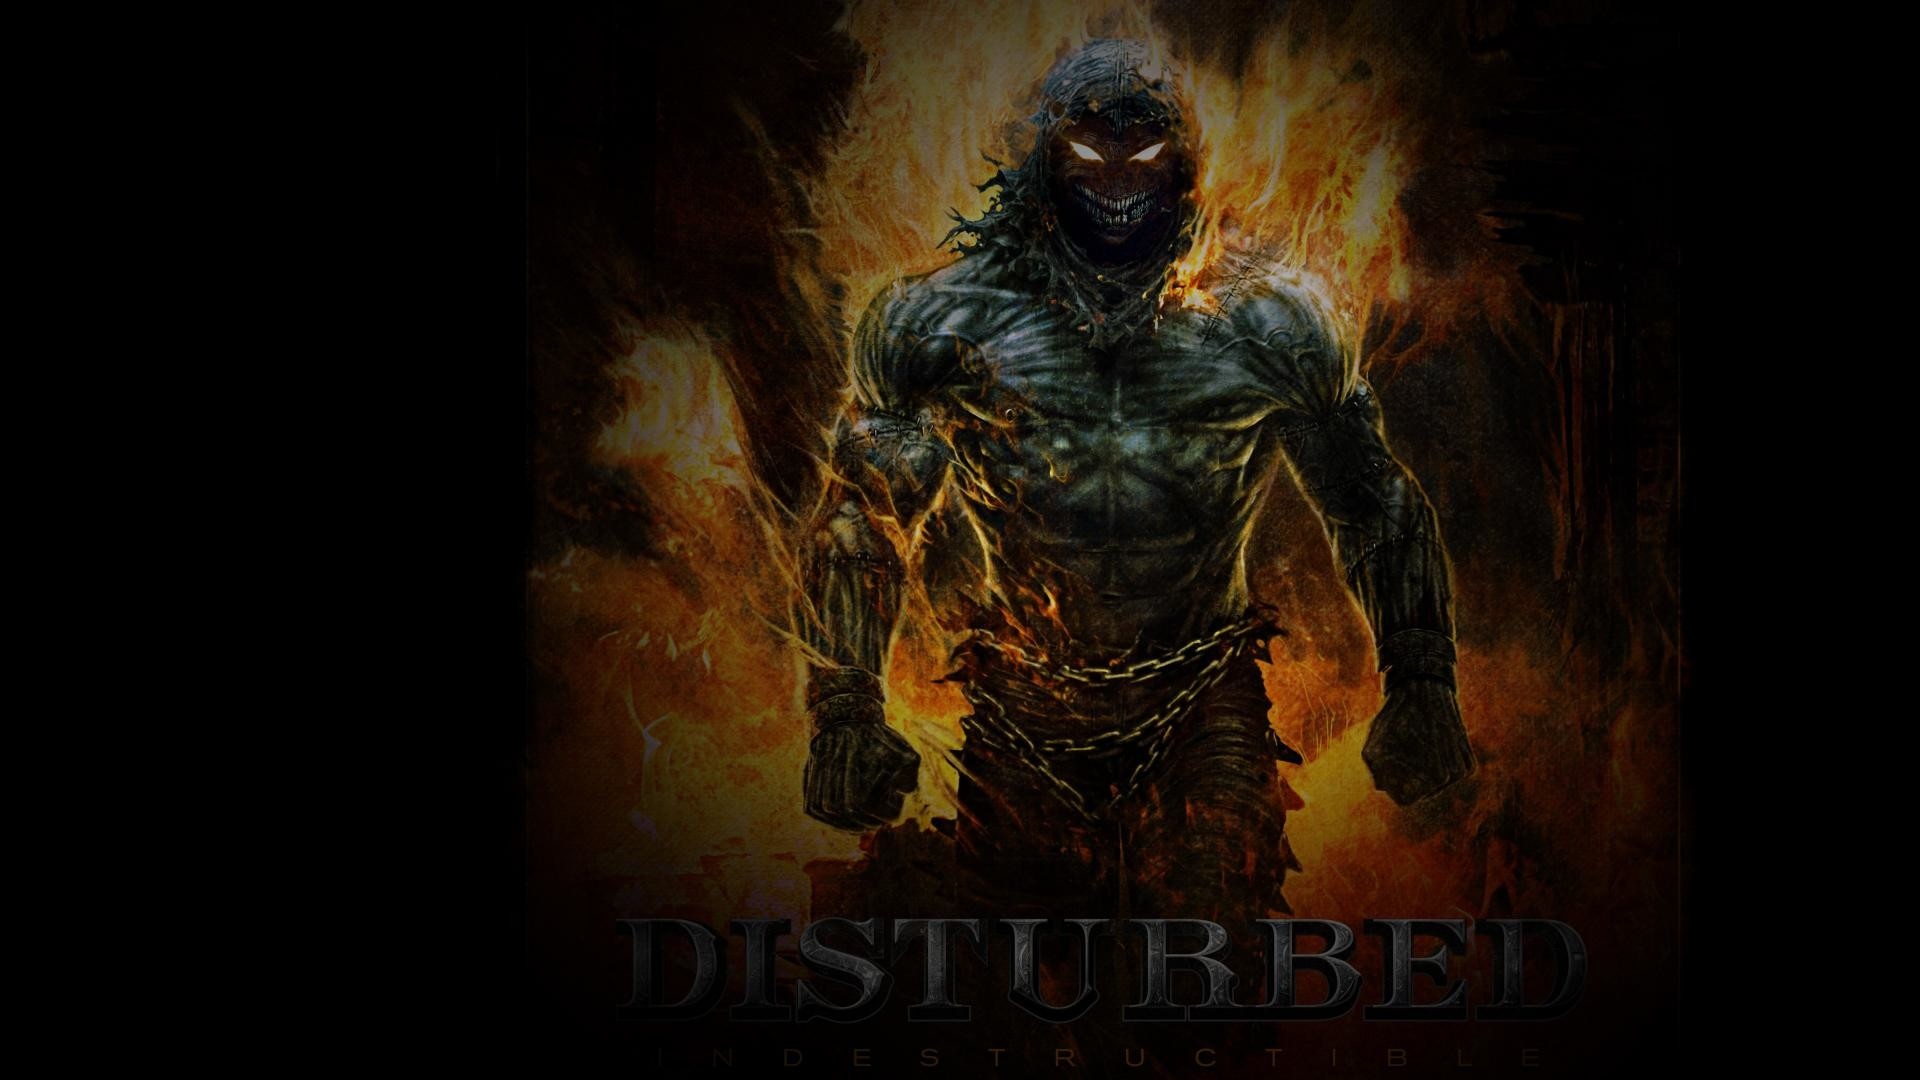 Disturbed Indestructible Heavy Metal Music Bands Hd Wallpaper 1920x1080px